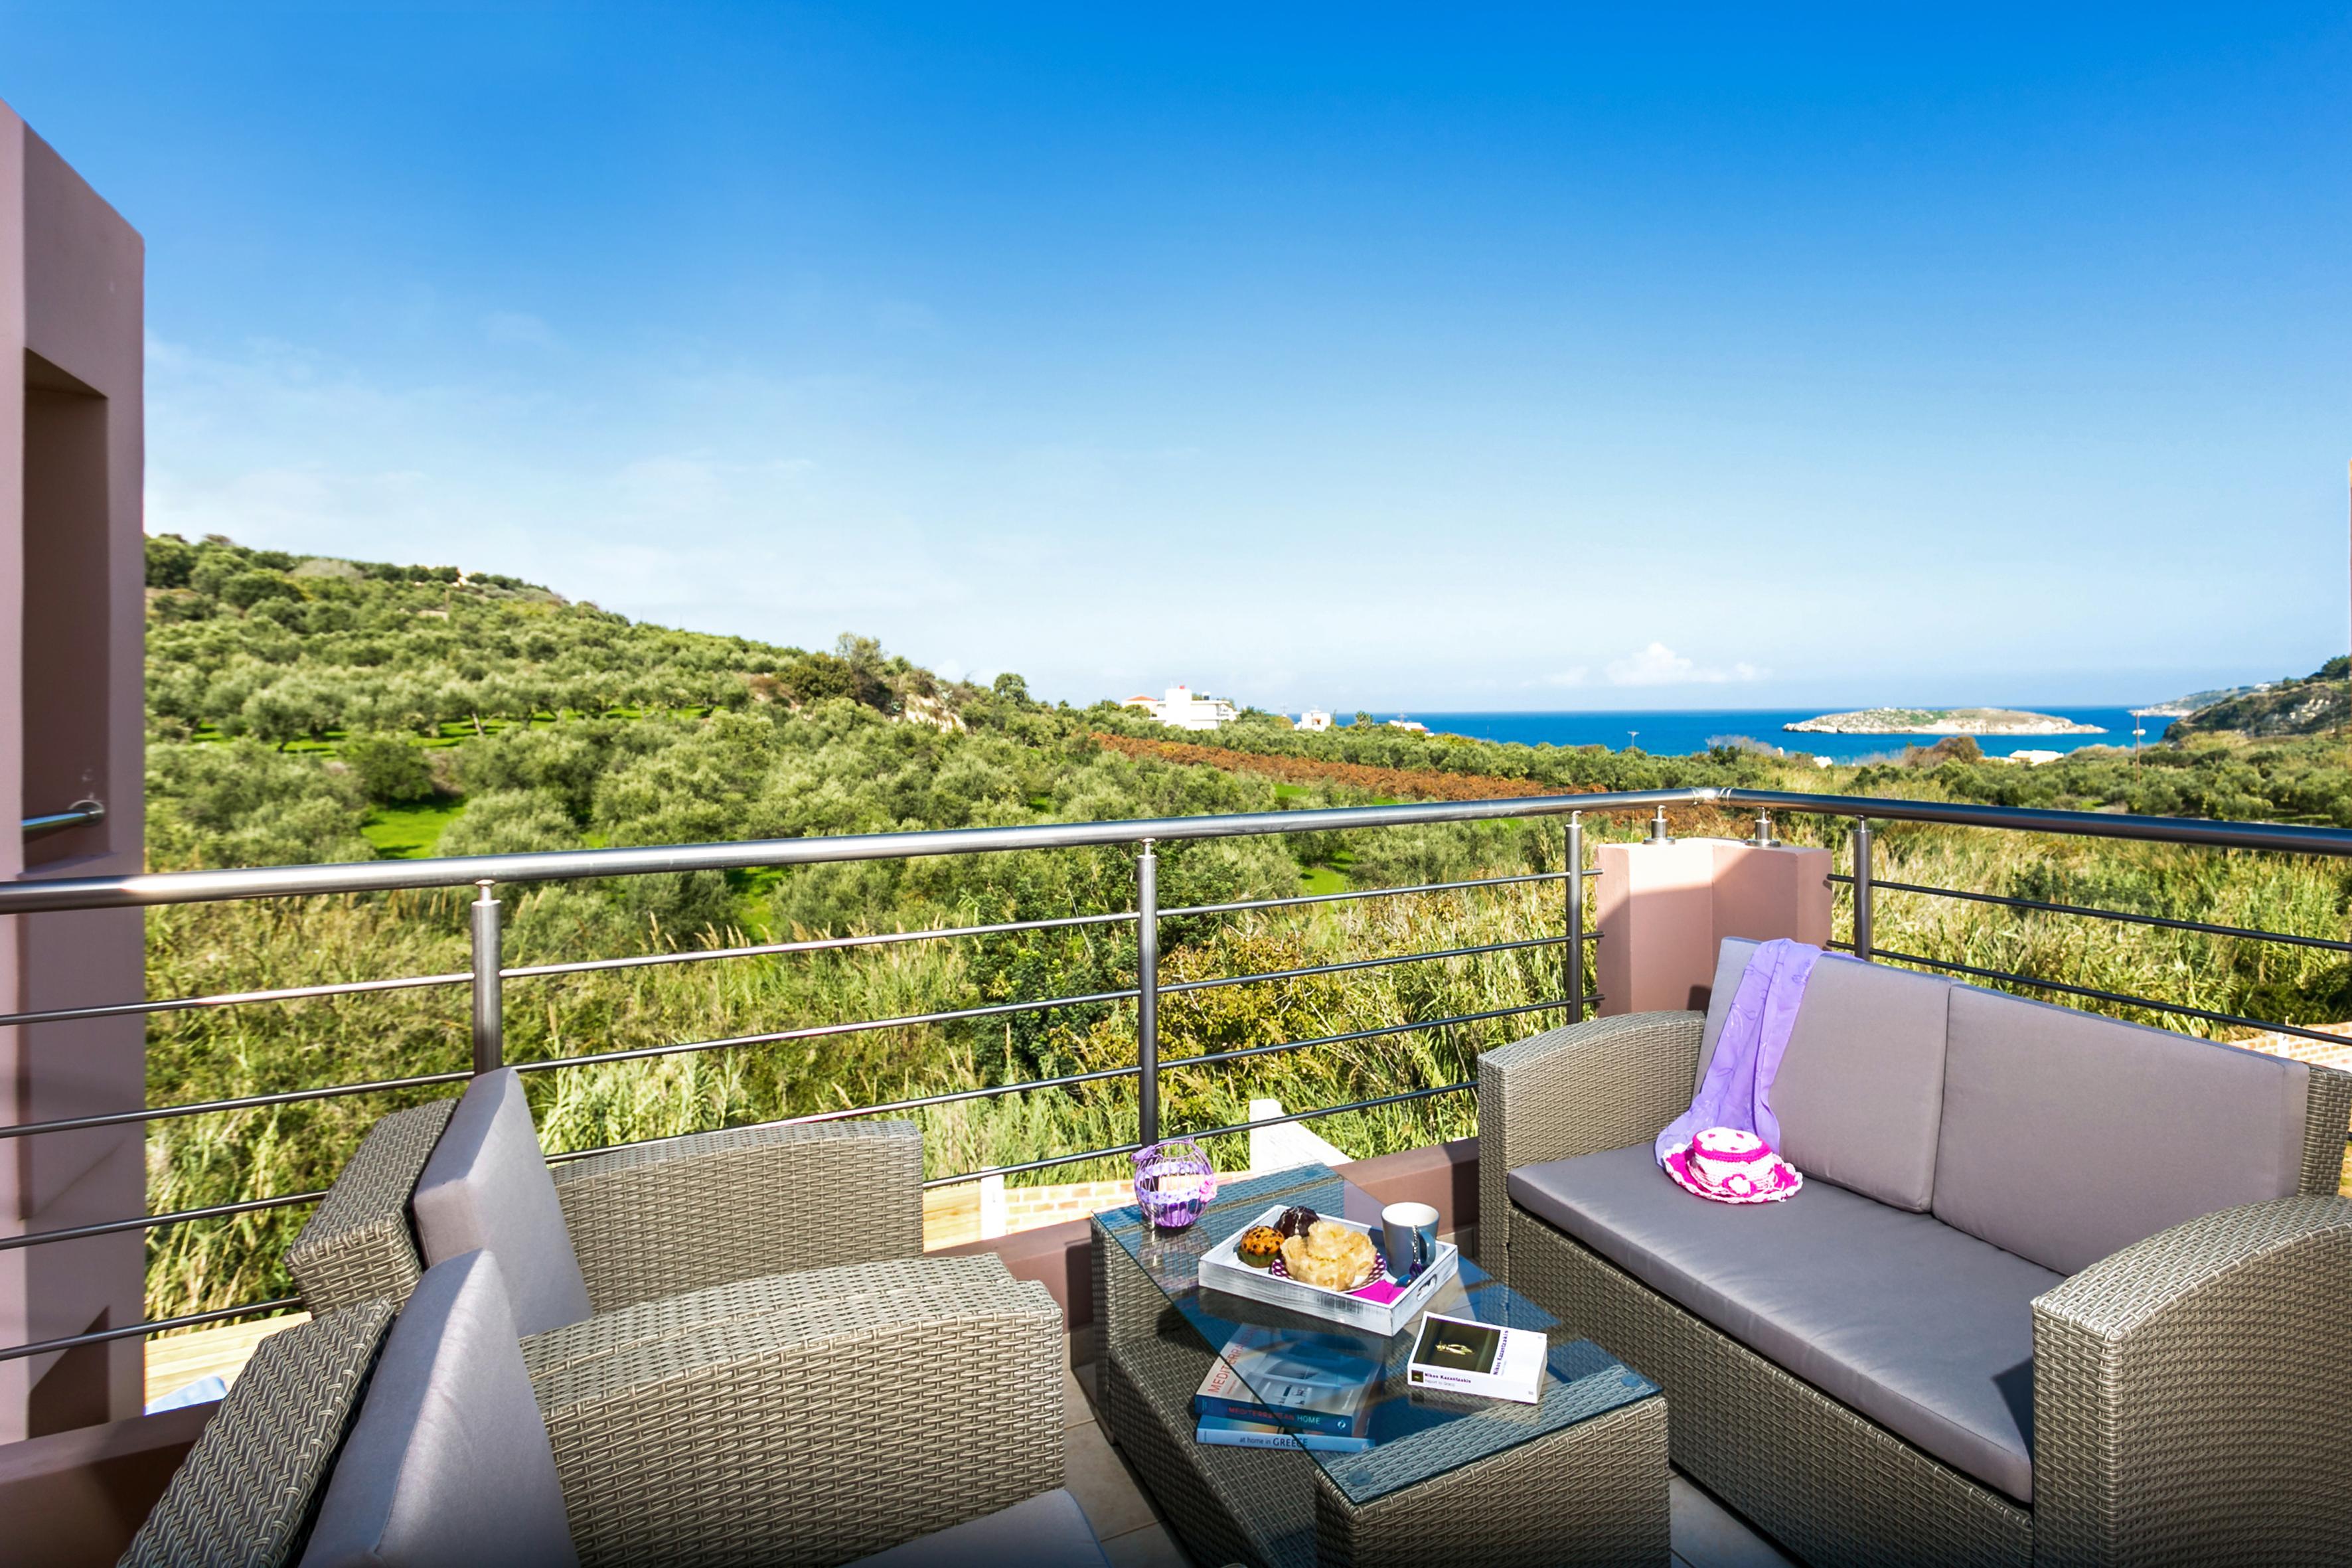 Ferienhaus Villa Mimis mit privatem Pool nr Almyrida & Kalyves (2123676), Neon Khorion Kriti, Kreta Nordküste, Kreta, Griechenland, Bild 3